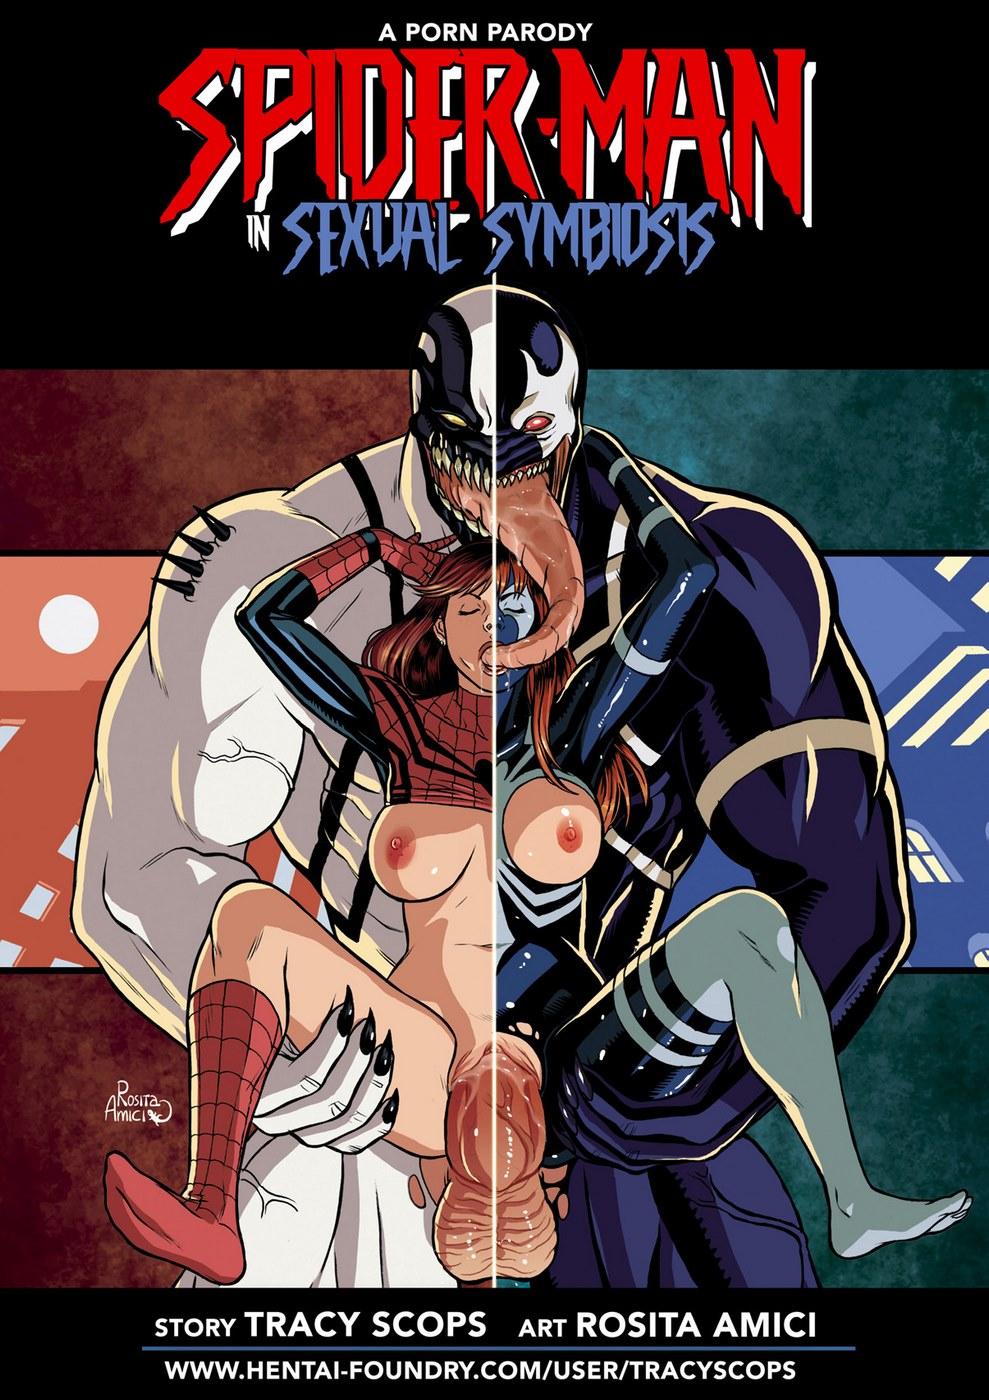 Spider-Man Sexual Symbiosis 1 image 1